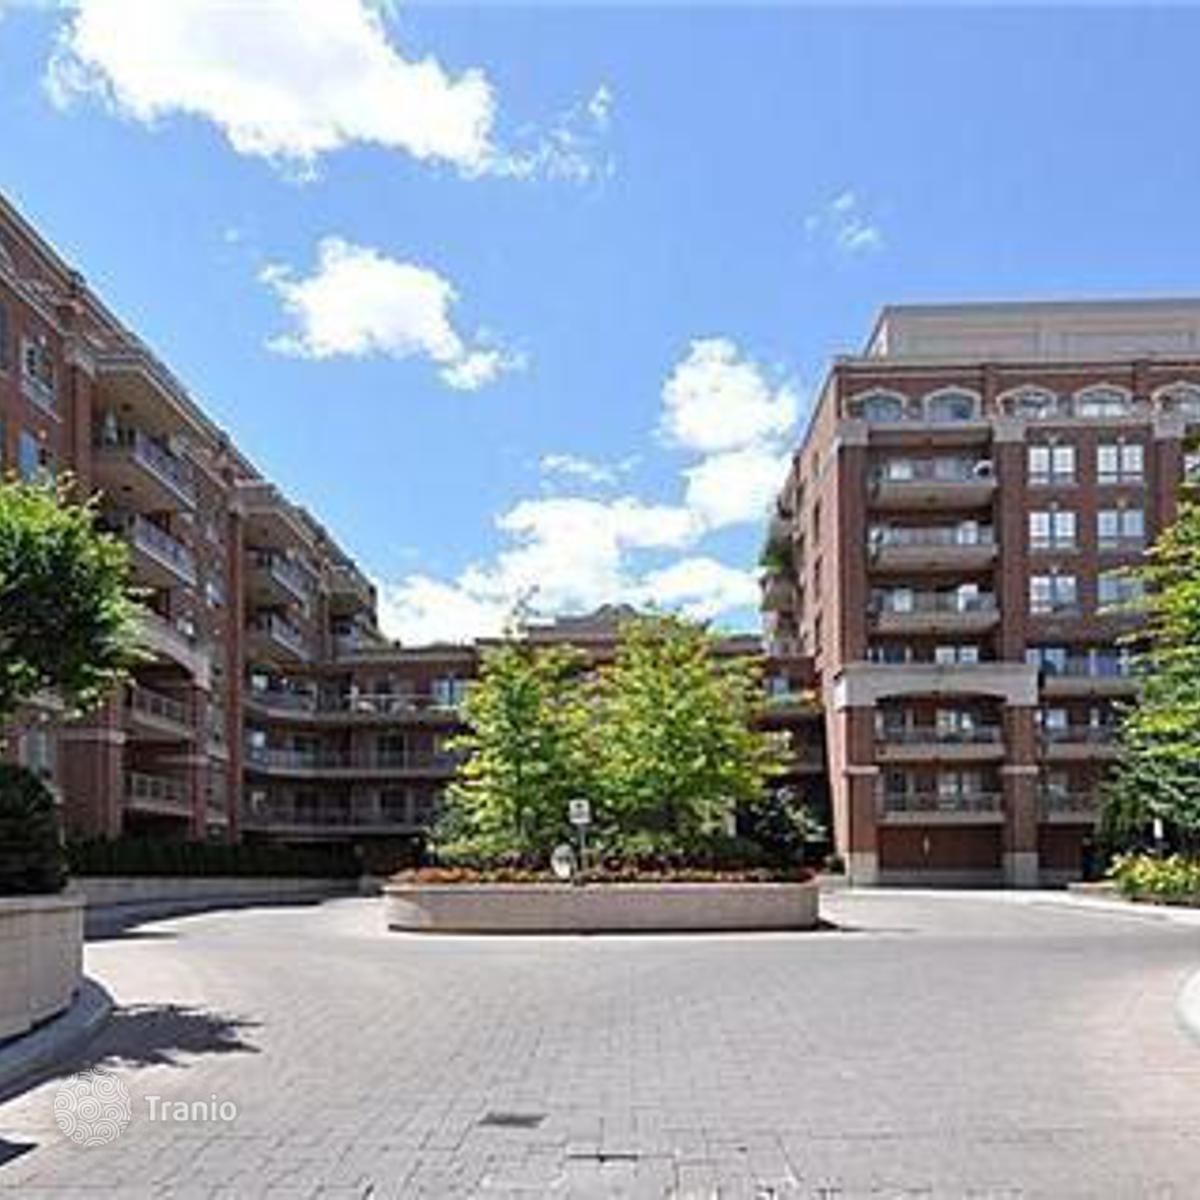 Toronto Apartments: Listing #1339266 In Toronto, Ontario, Canada